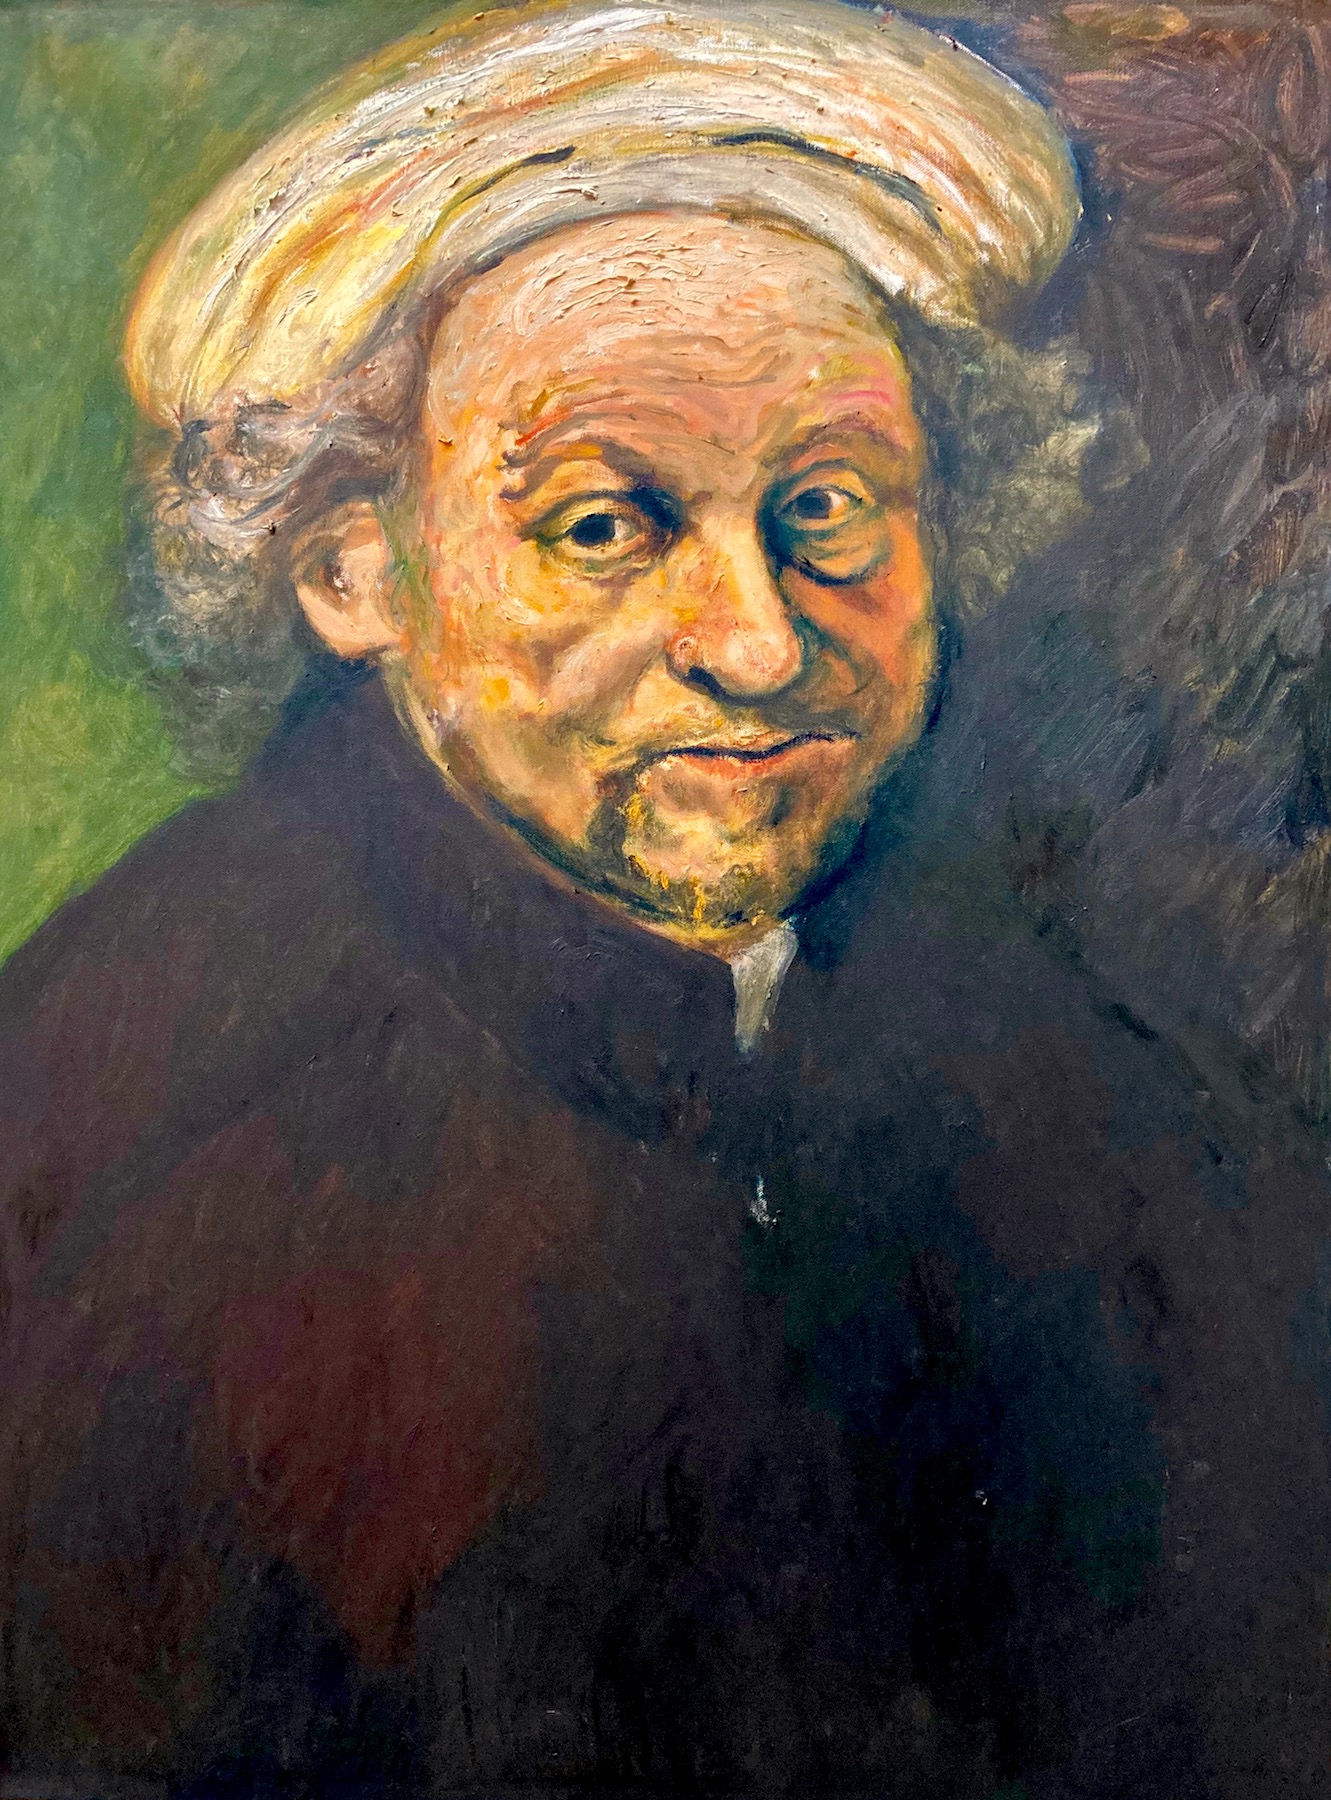 Santiago Pérez: Meditation on Rembrandt 6